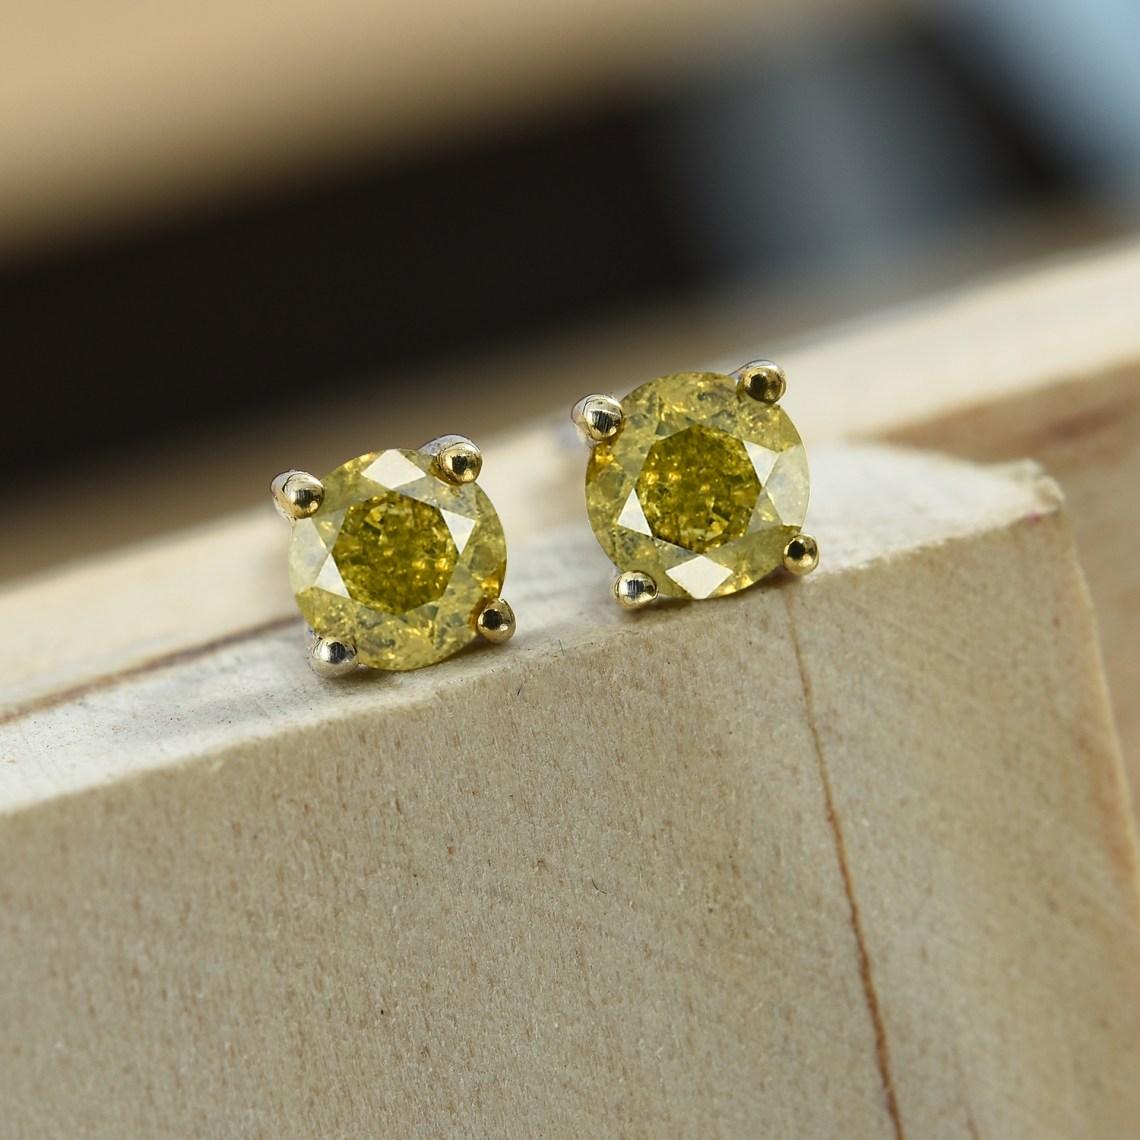 Yellow diamond stud earrings displayed on wooden plinth.